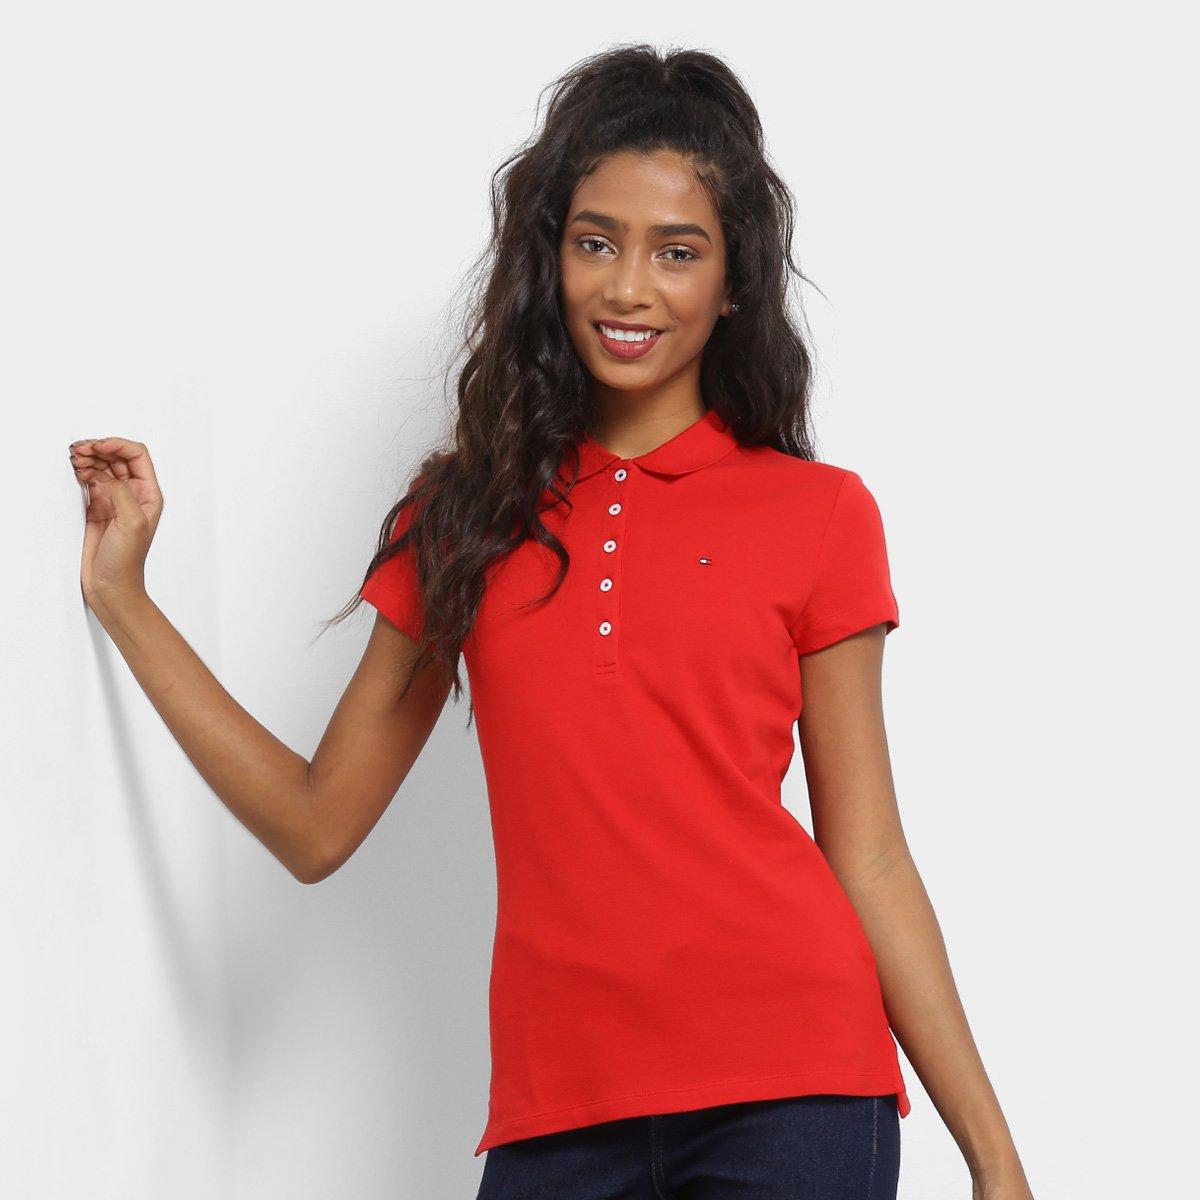 301fd34728 ... Camisa Polo Tommy Hilfiger Básica Feminina - Compre Agora Netshoes  646bc359714824  Camisa Polo Rosa ...